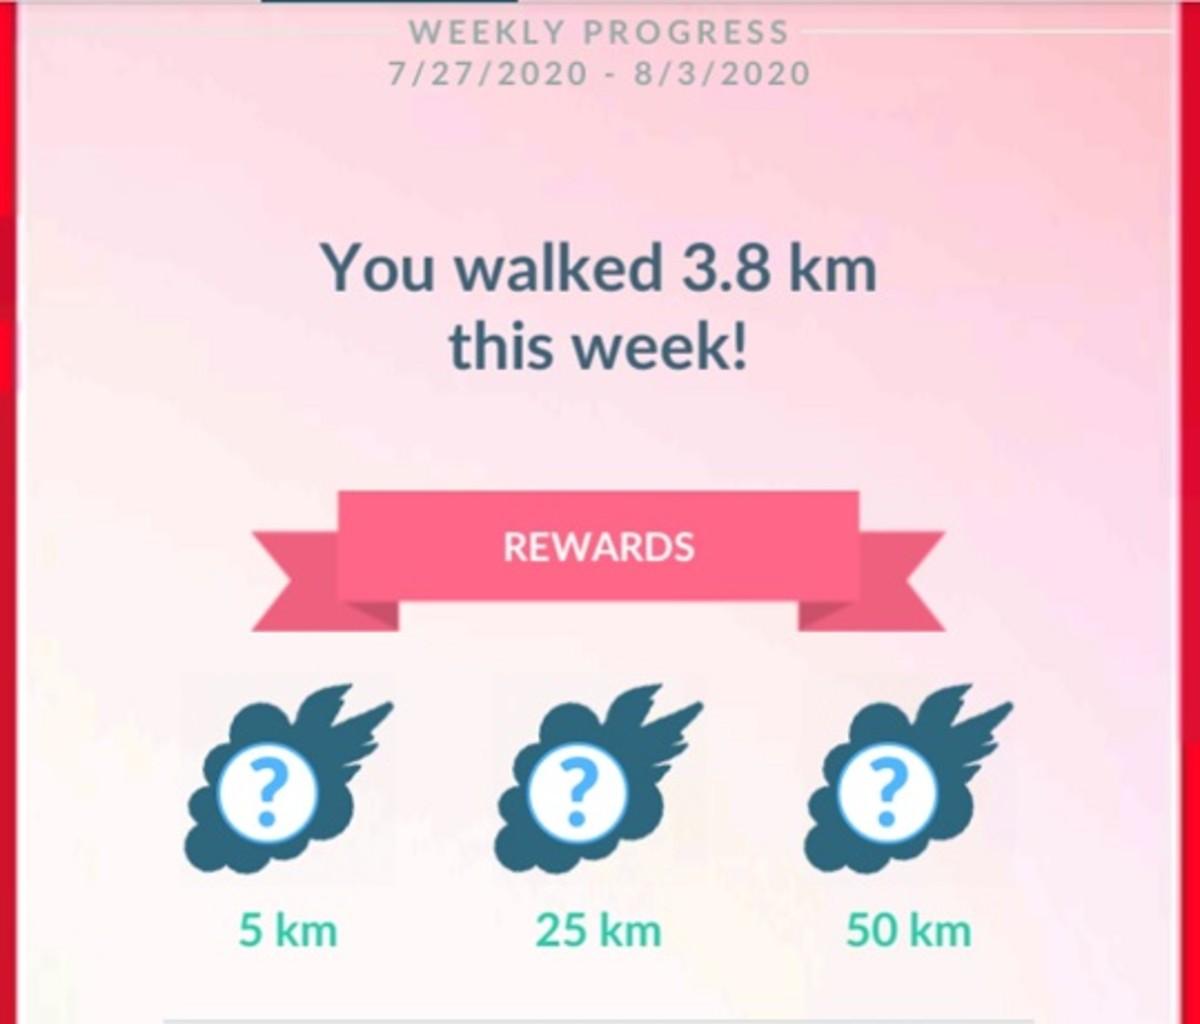 The 100km reward is a hidden tier.